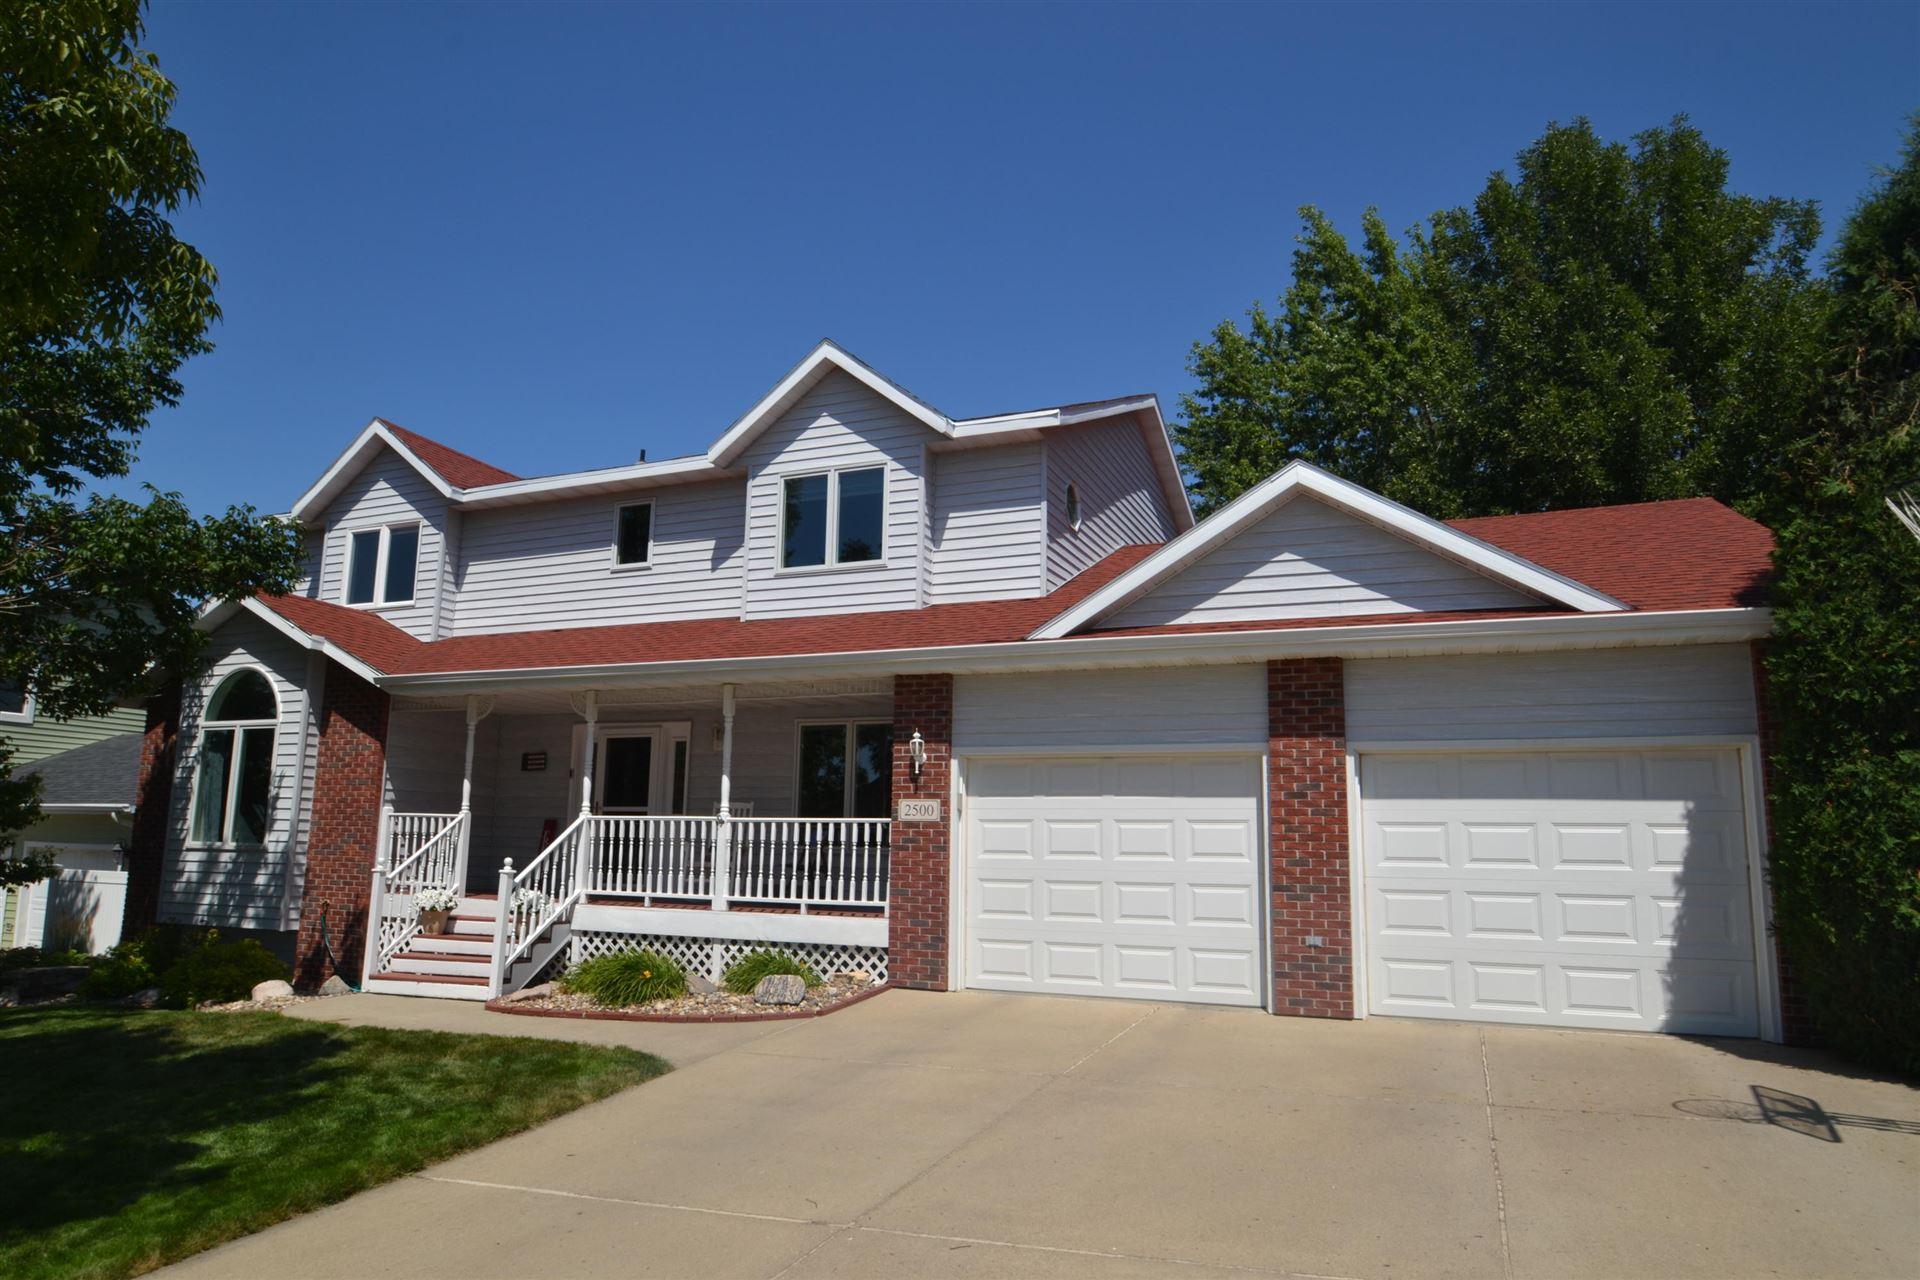 2500 Coolidge Avenue, Bismarck, ND 58501 - #: 407927